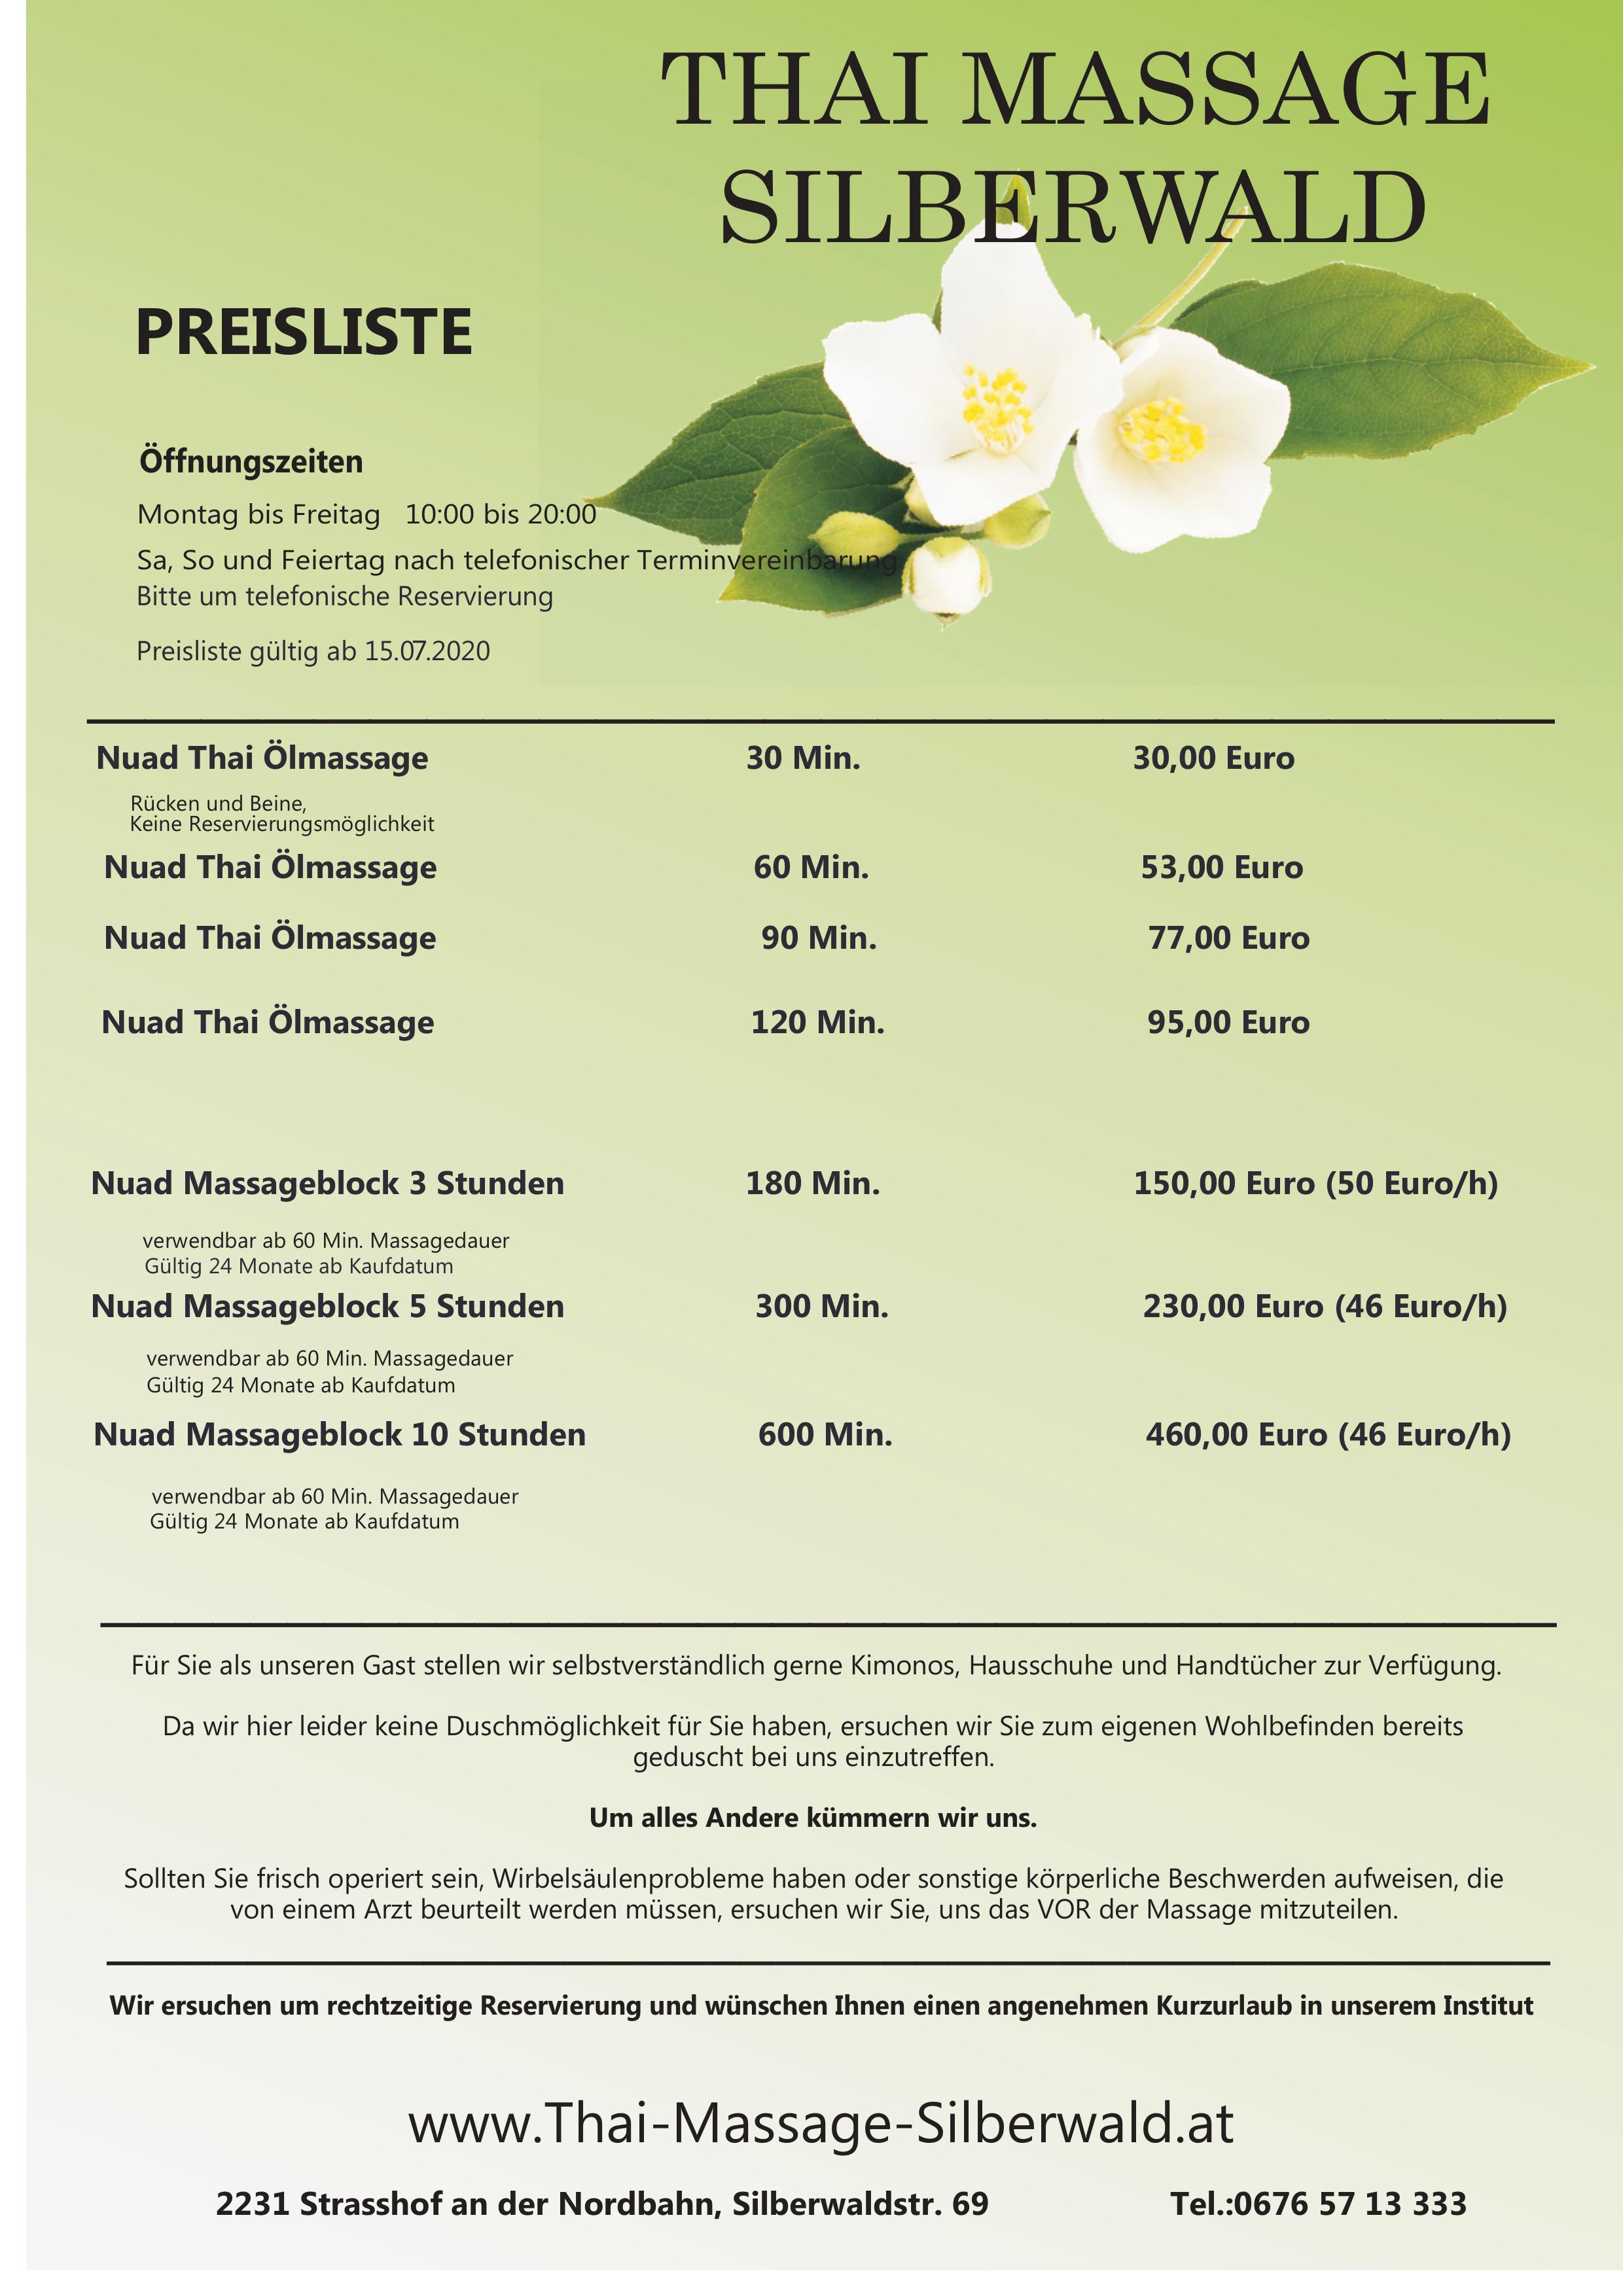 http://www.thai-massage-silberwald.at/media/Preislist%20neu%2015-07-2020%20mit%2030%20Min%20neu.jpg